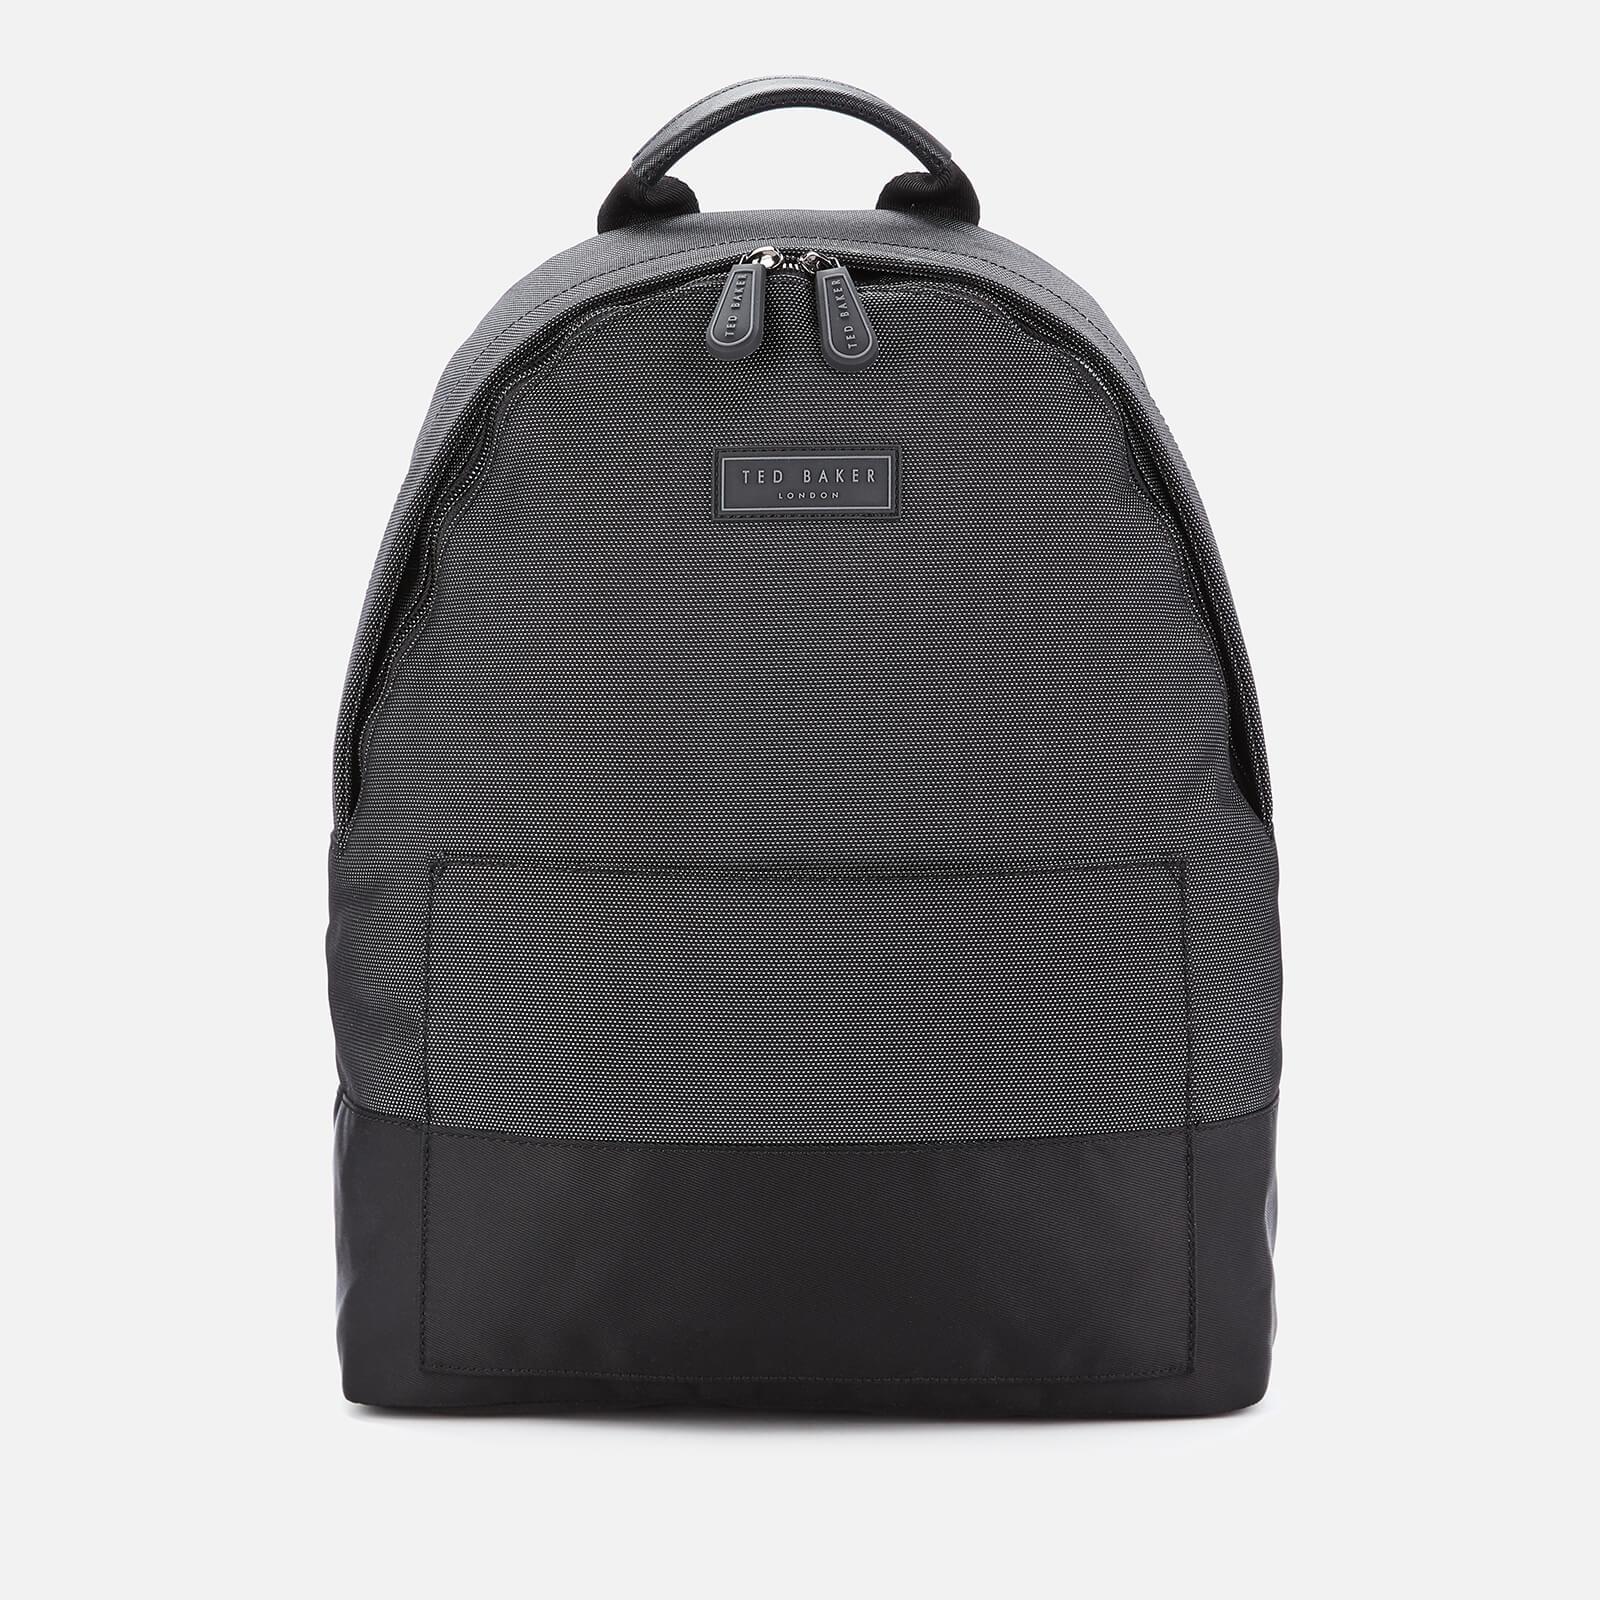 1ae5f65ec002 Ted Baker Men s Karat Nylon Backpack - Black Mens Accessories ...